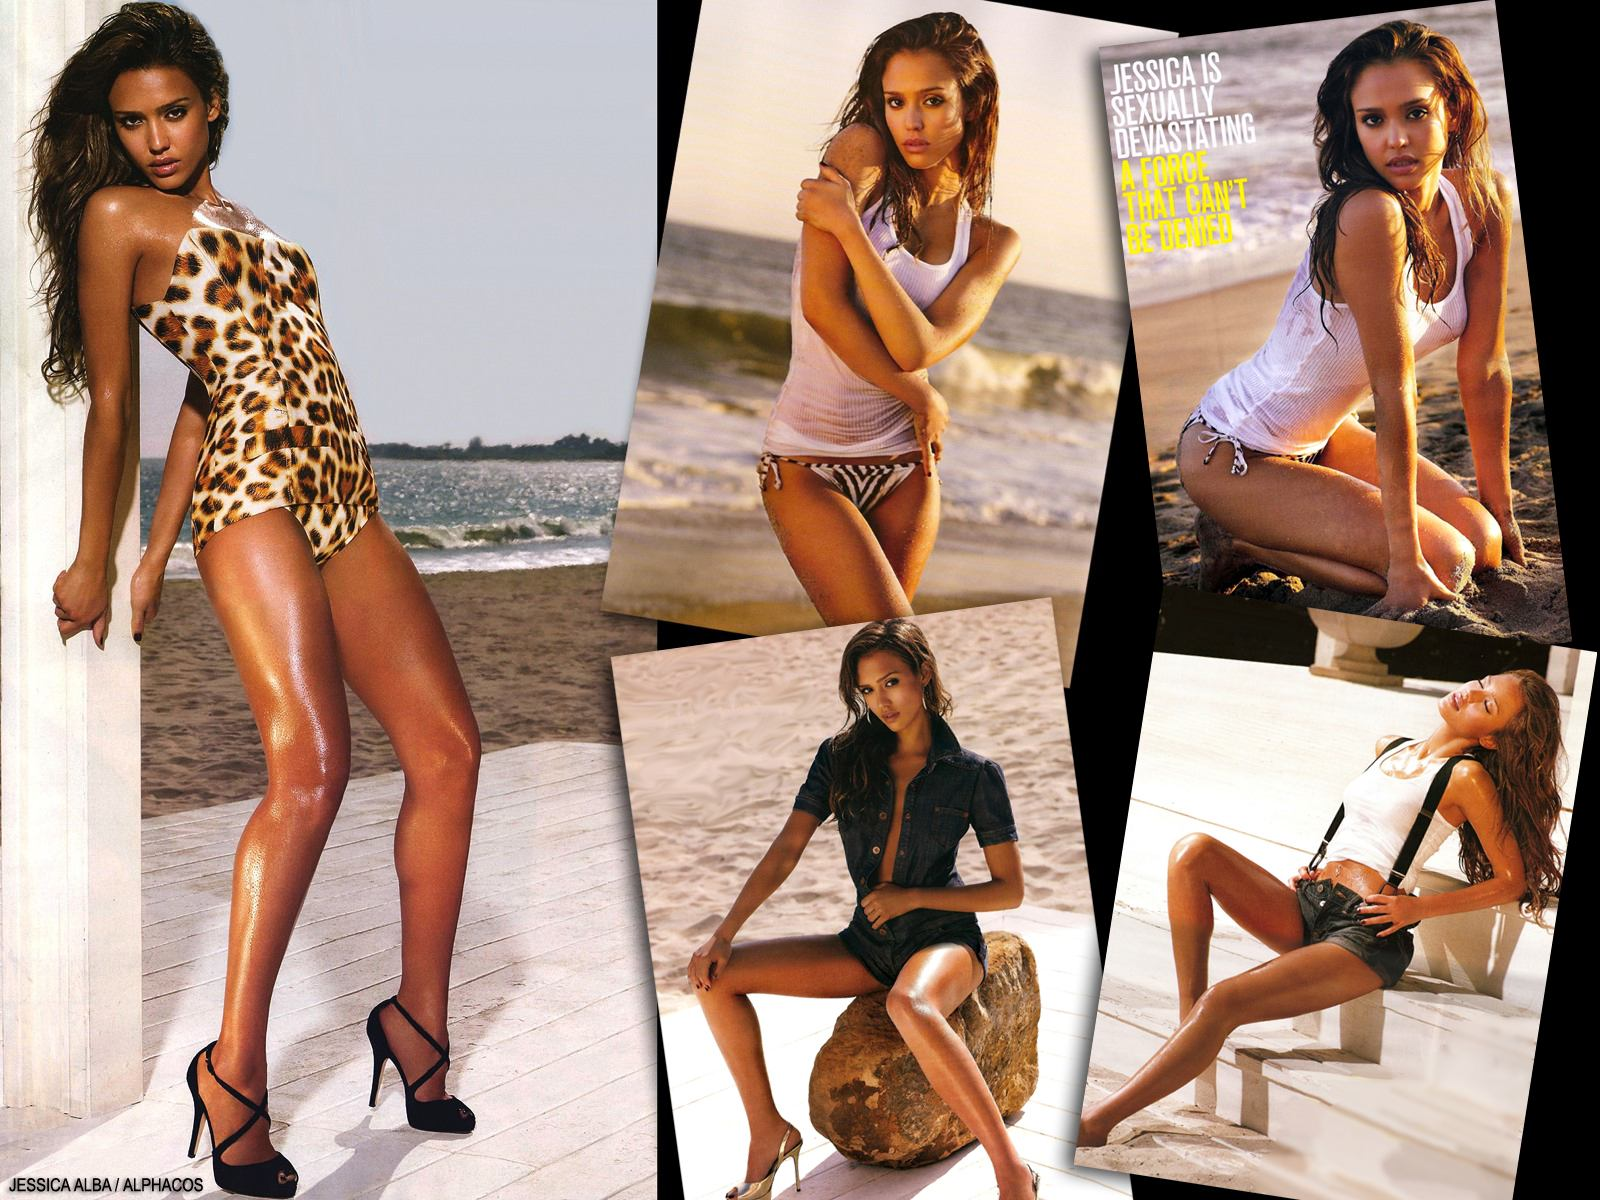 http://images.fanpop.com/images/image_uploads/Jessica-jessica-alba-583265_1600_1200.jpg